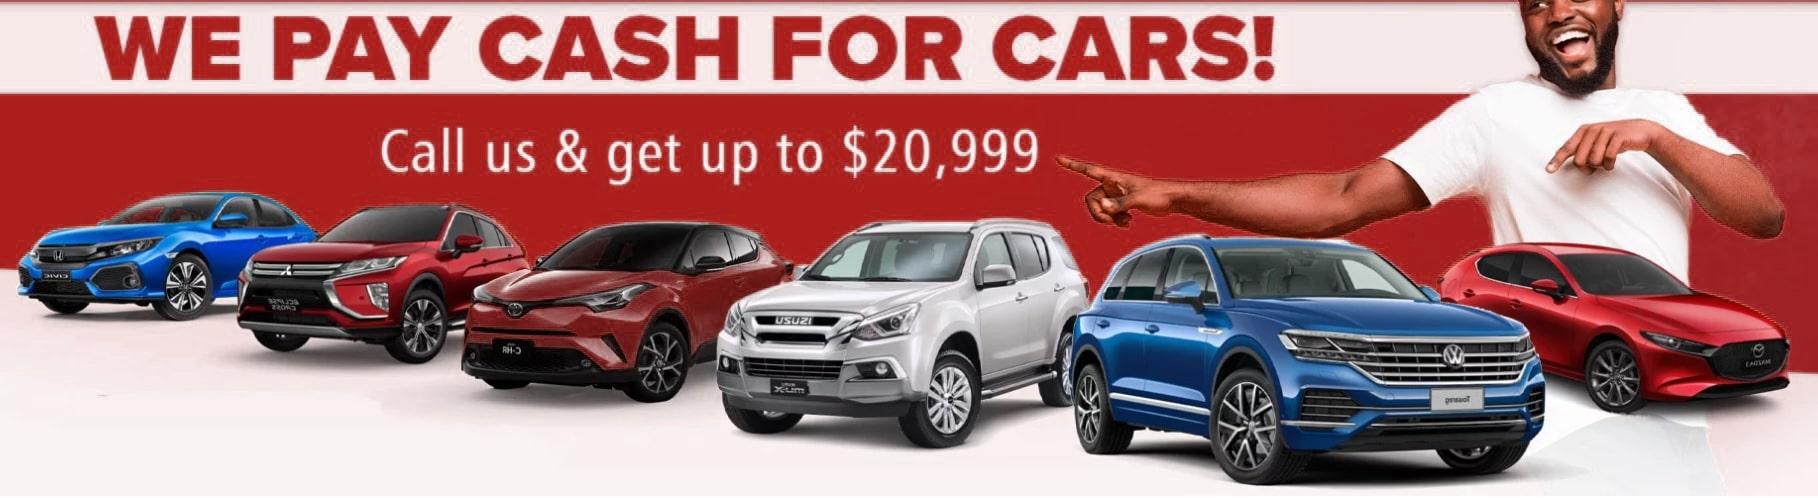 Cash for Cars Carrum Downs